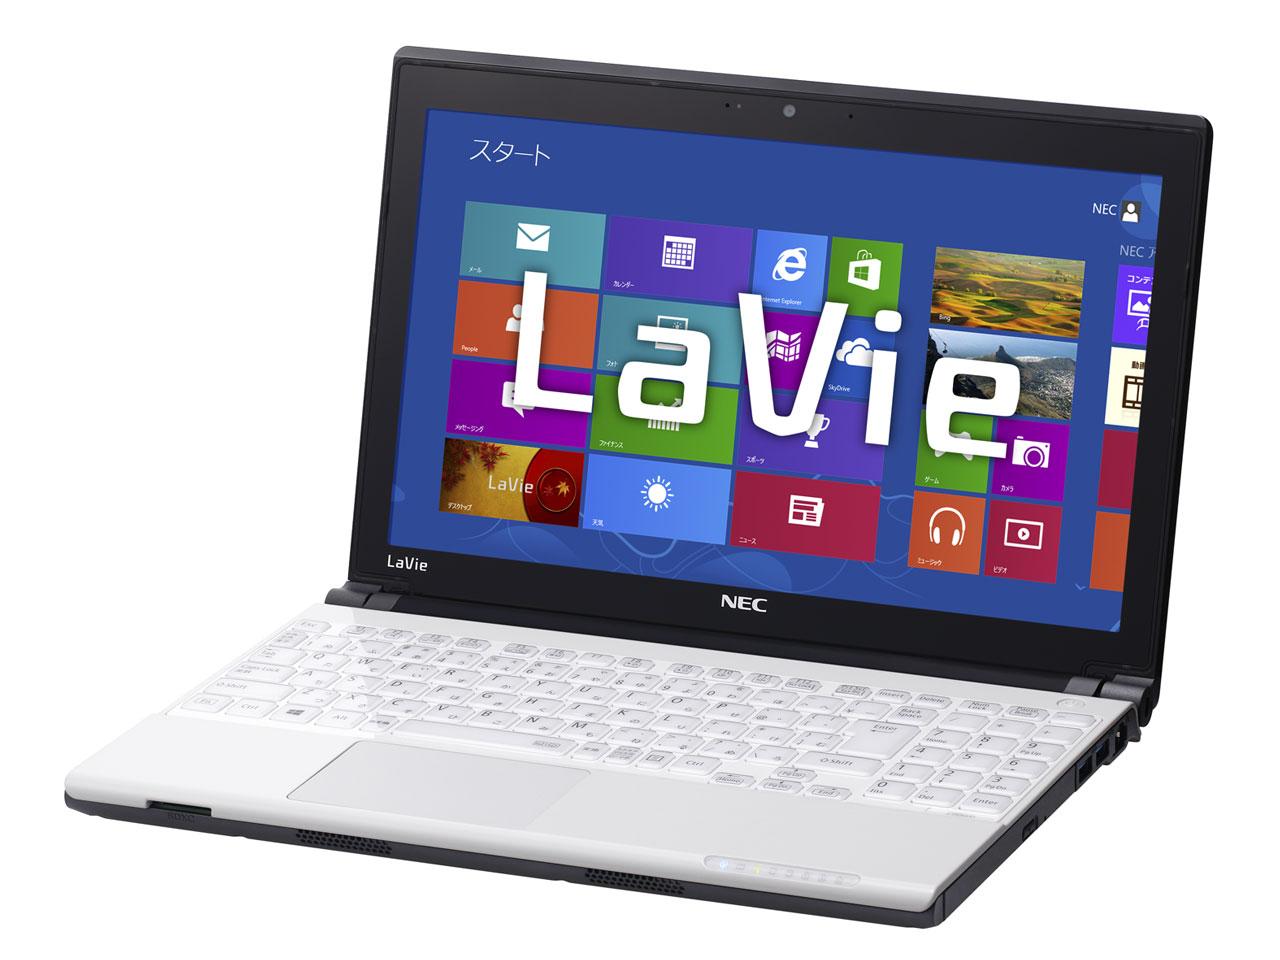 価格.com - LaVie M LM550/JS6W ...